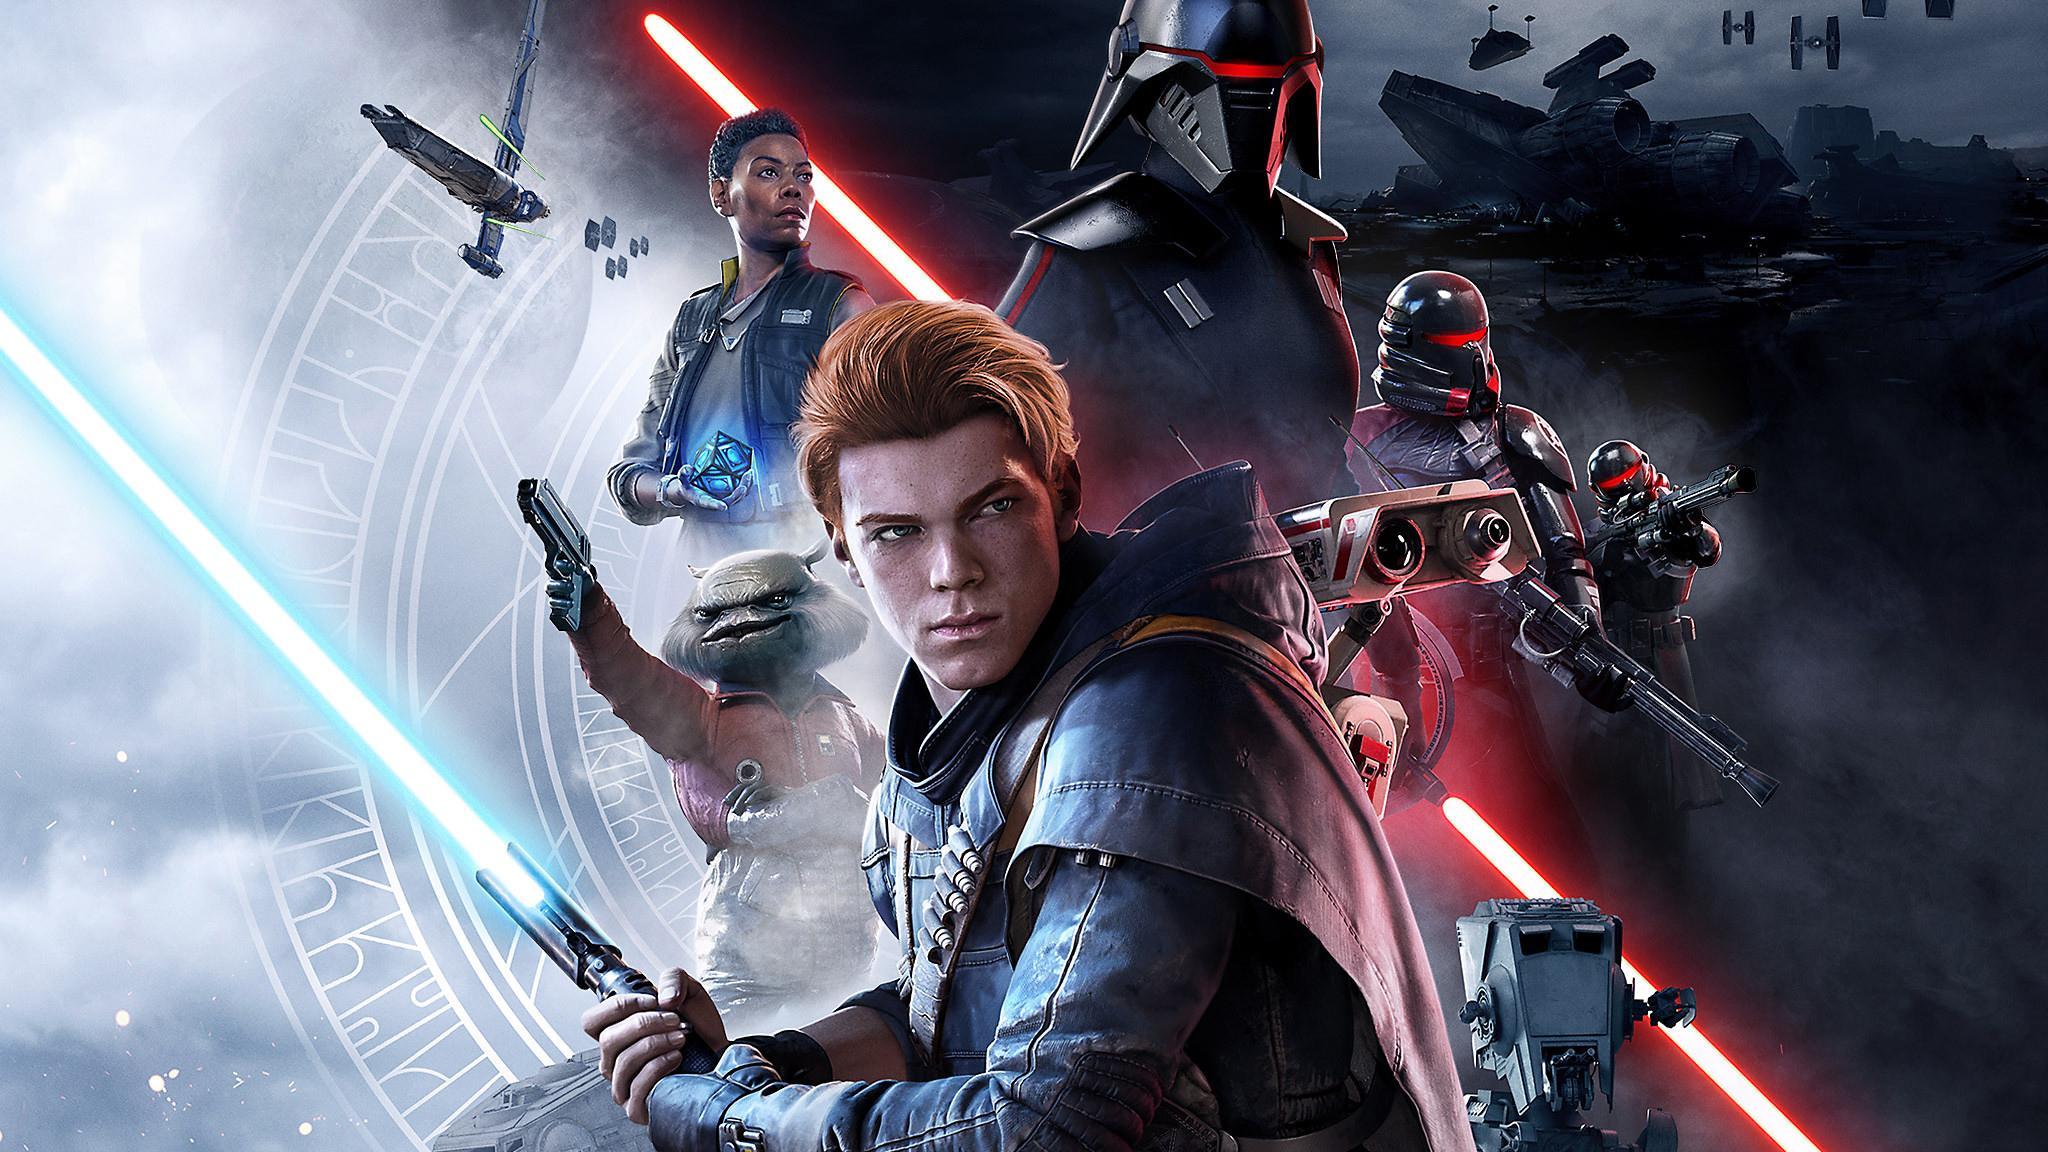 Star Wars Jedi Fallen Order Hd Wallpapers Wallpaper Cave